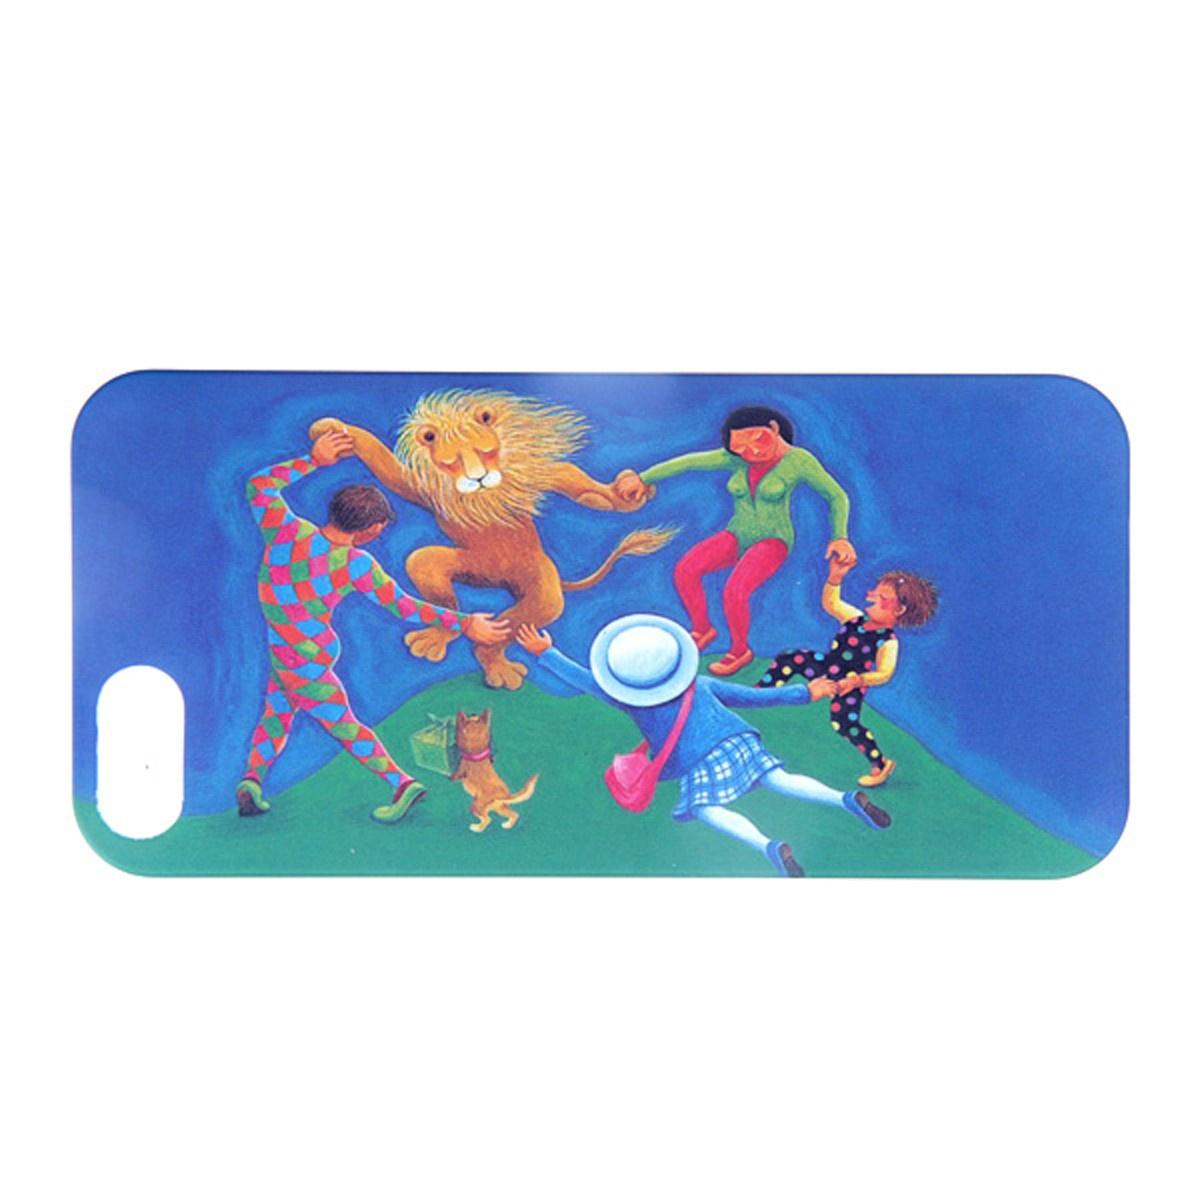 Чехол Mitya Veselkov KAFKA для IPhone 5, KAFKAFIVE-83, синий, зеленый цена и фото